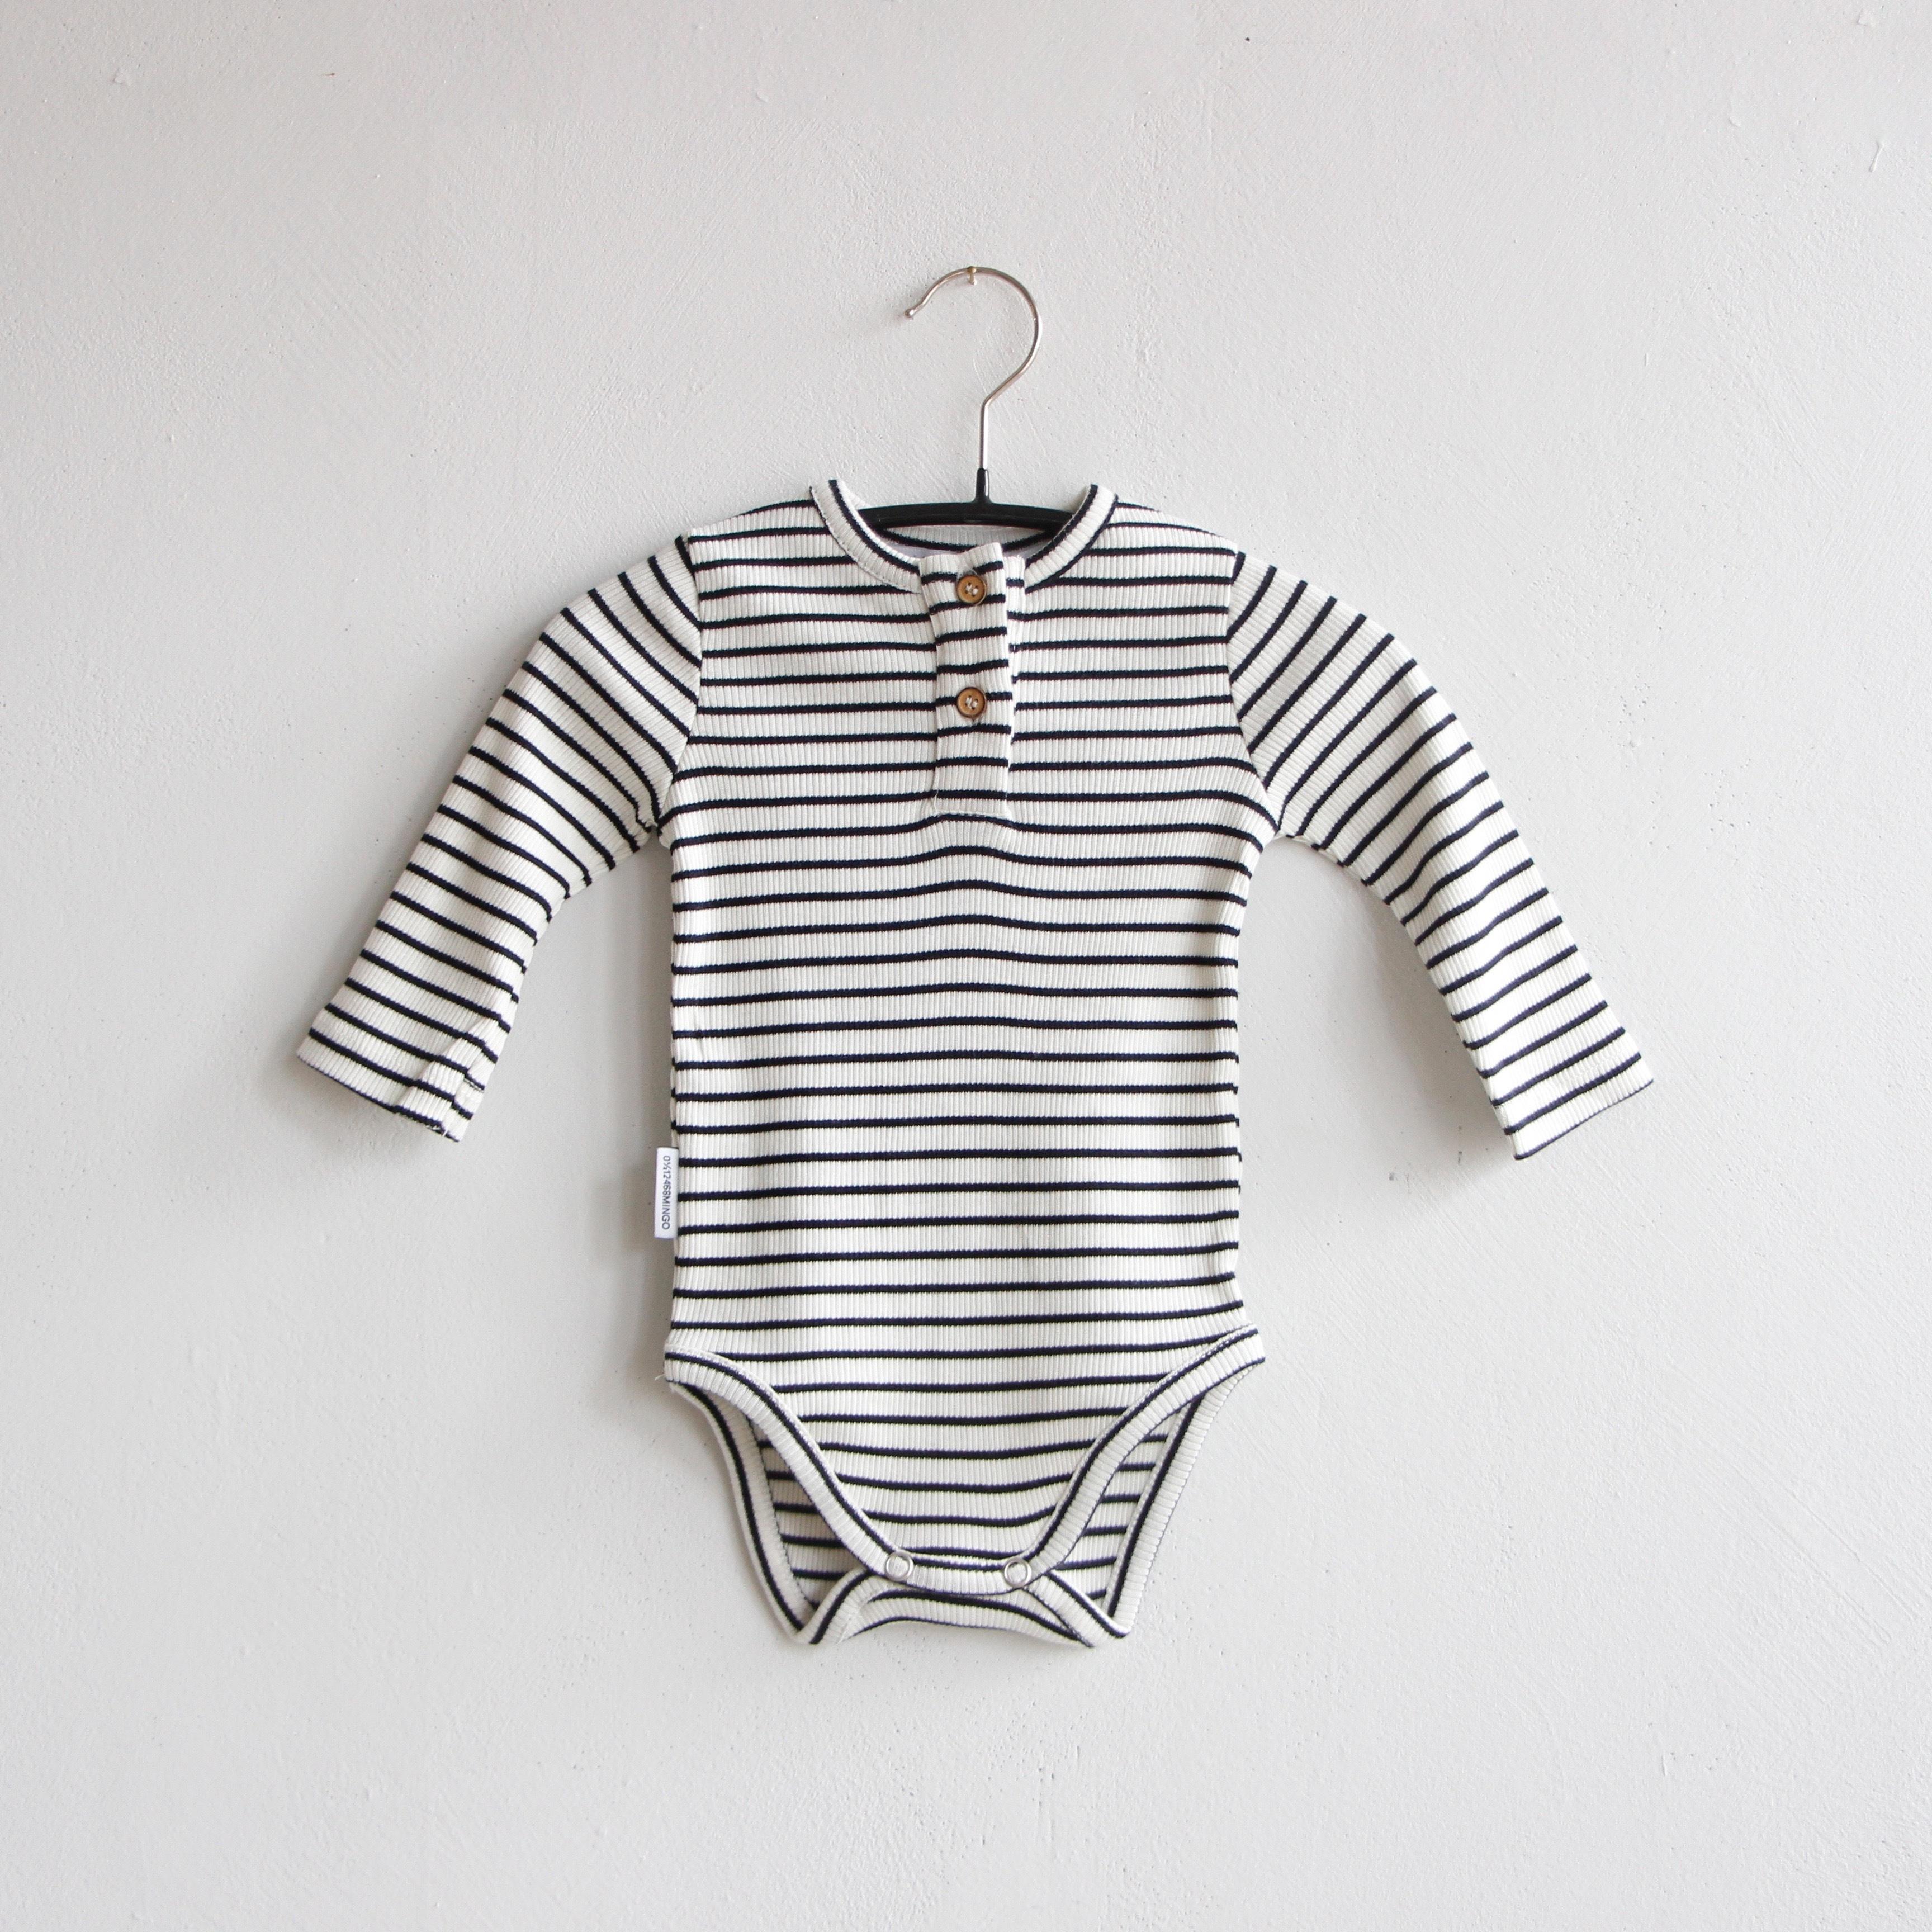 《MINGO.》Bodysuit / Stripes